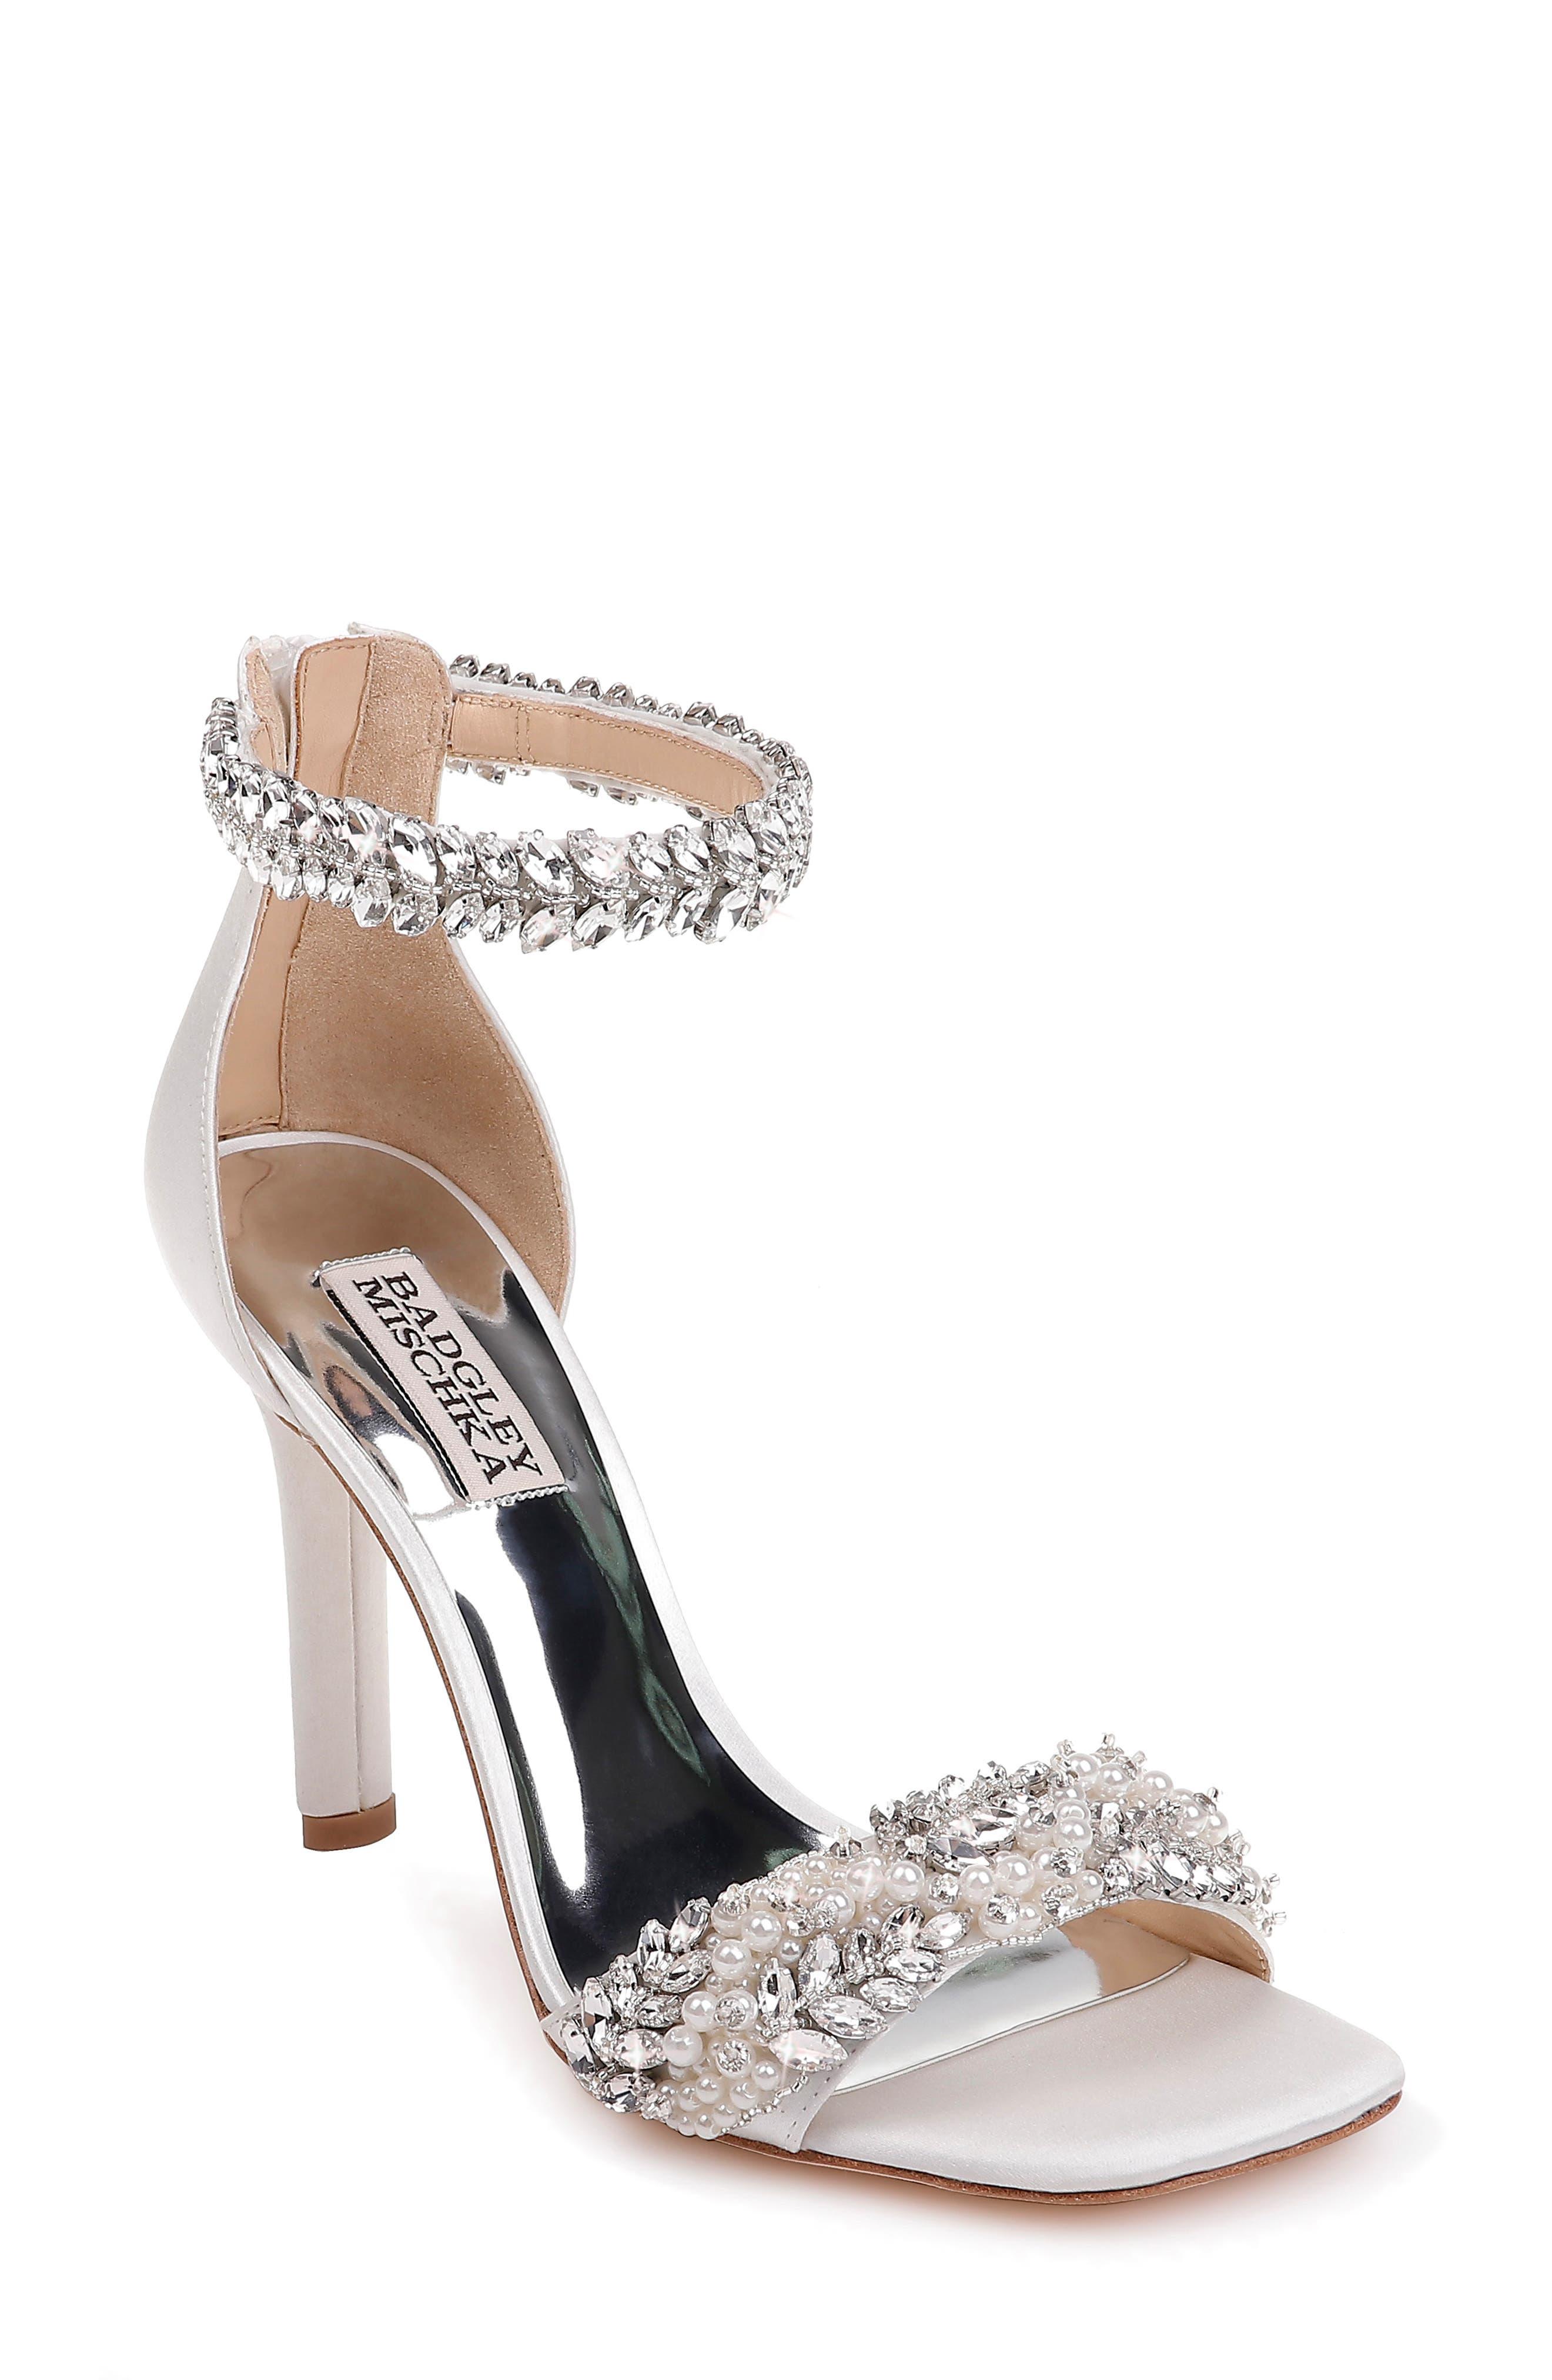 BADGLEY MISCHKA COLLECTION, Badgley Mischka Fiorenza Crystal & Imitation Pearl Embellished Sandal, Main thumbnail 1, color, SOFT WHITE SATIN